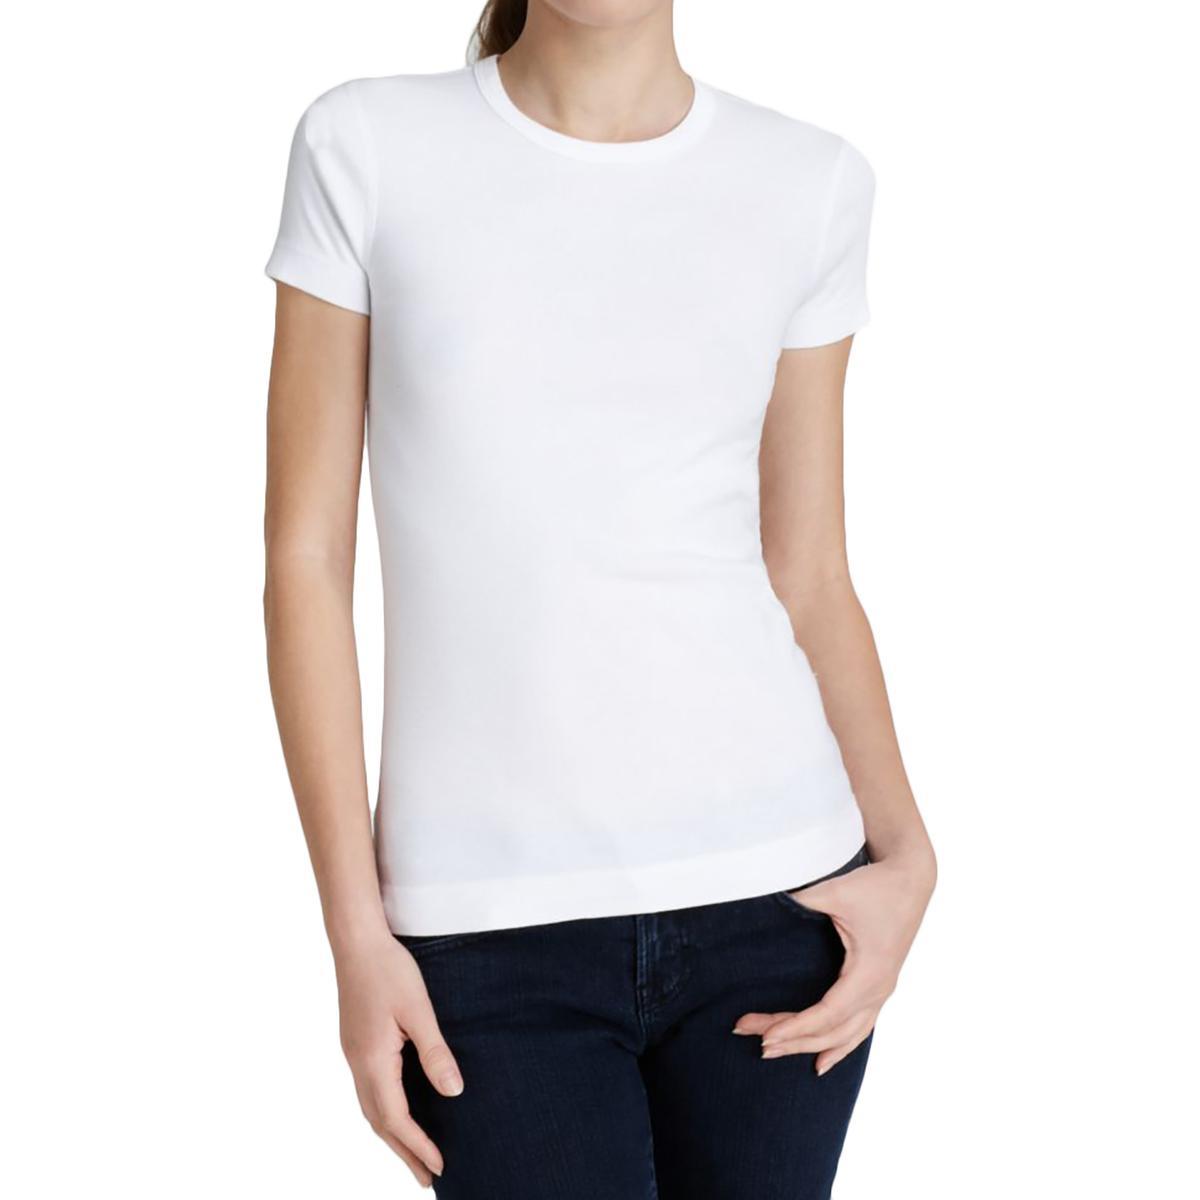 Three Dots 6226 Womens Cotton Short Sleeves Crewneck T